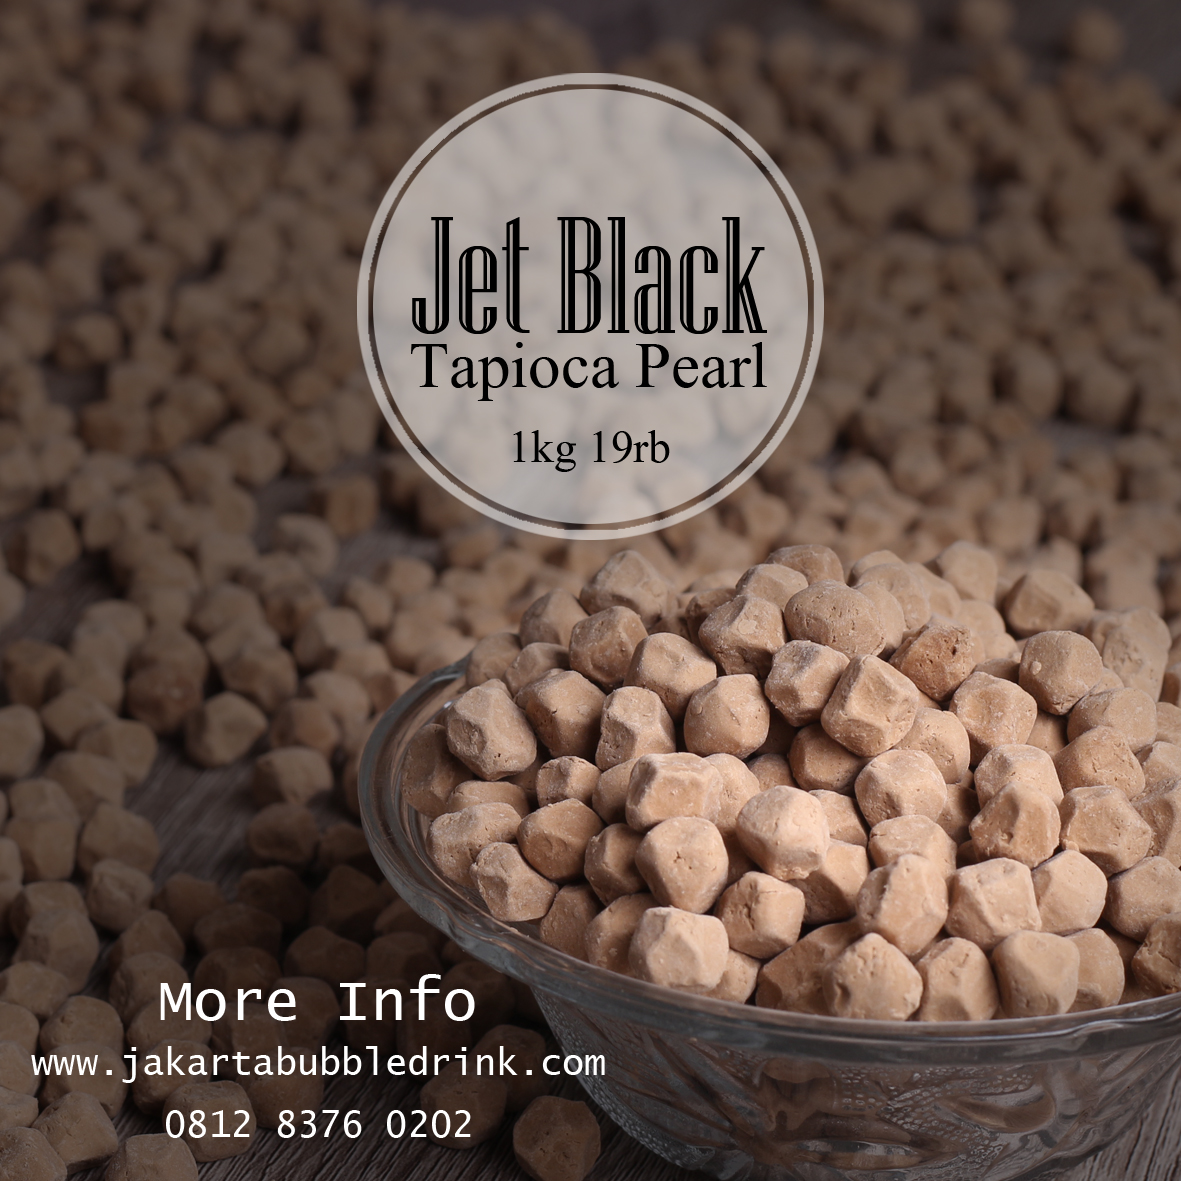 Supplier Distributor Agen Toko Bubuk Minuman Bubble Drink Jual Tapioca Pearl